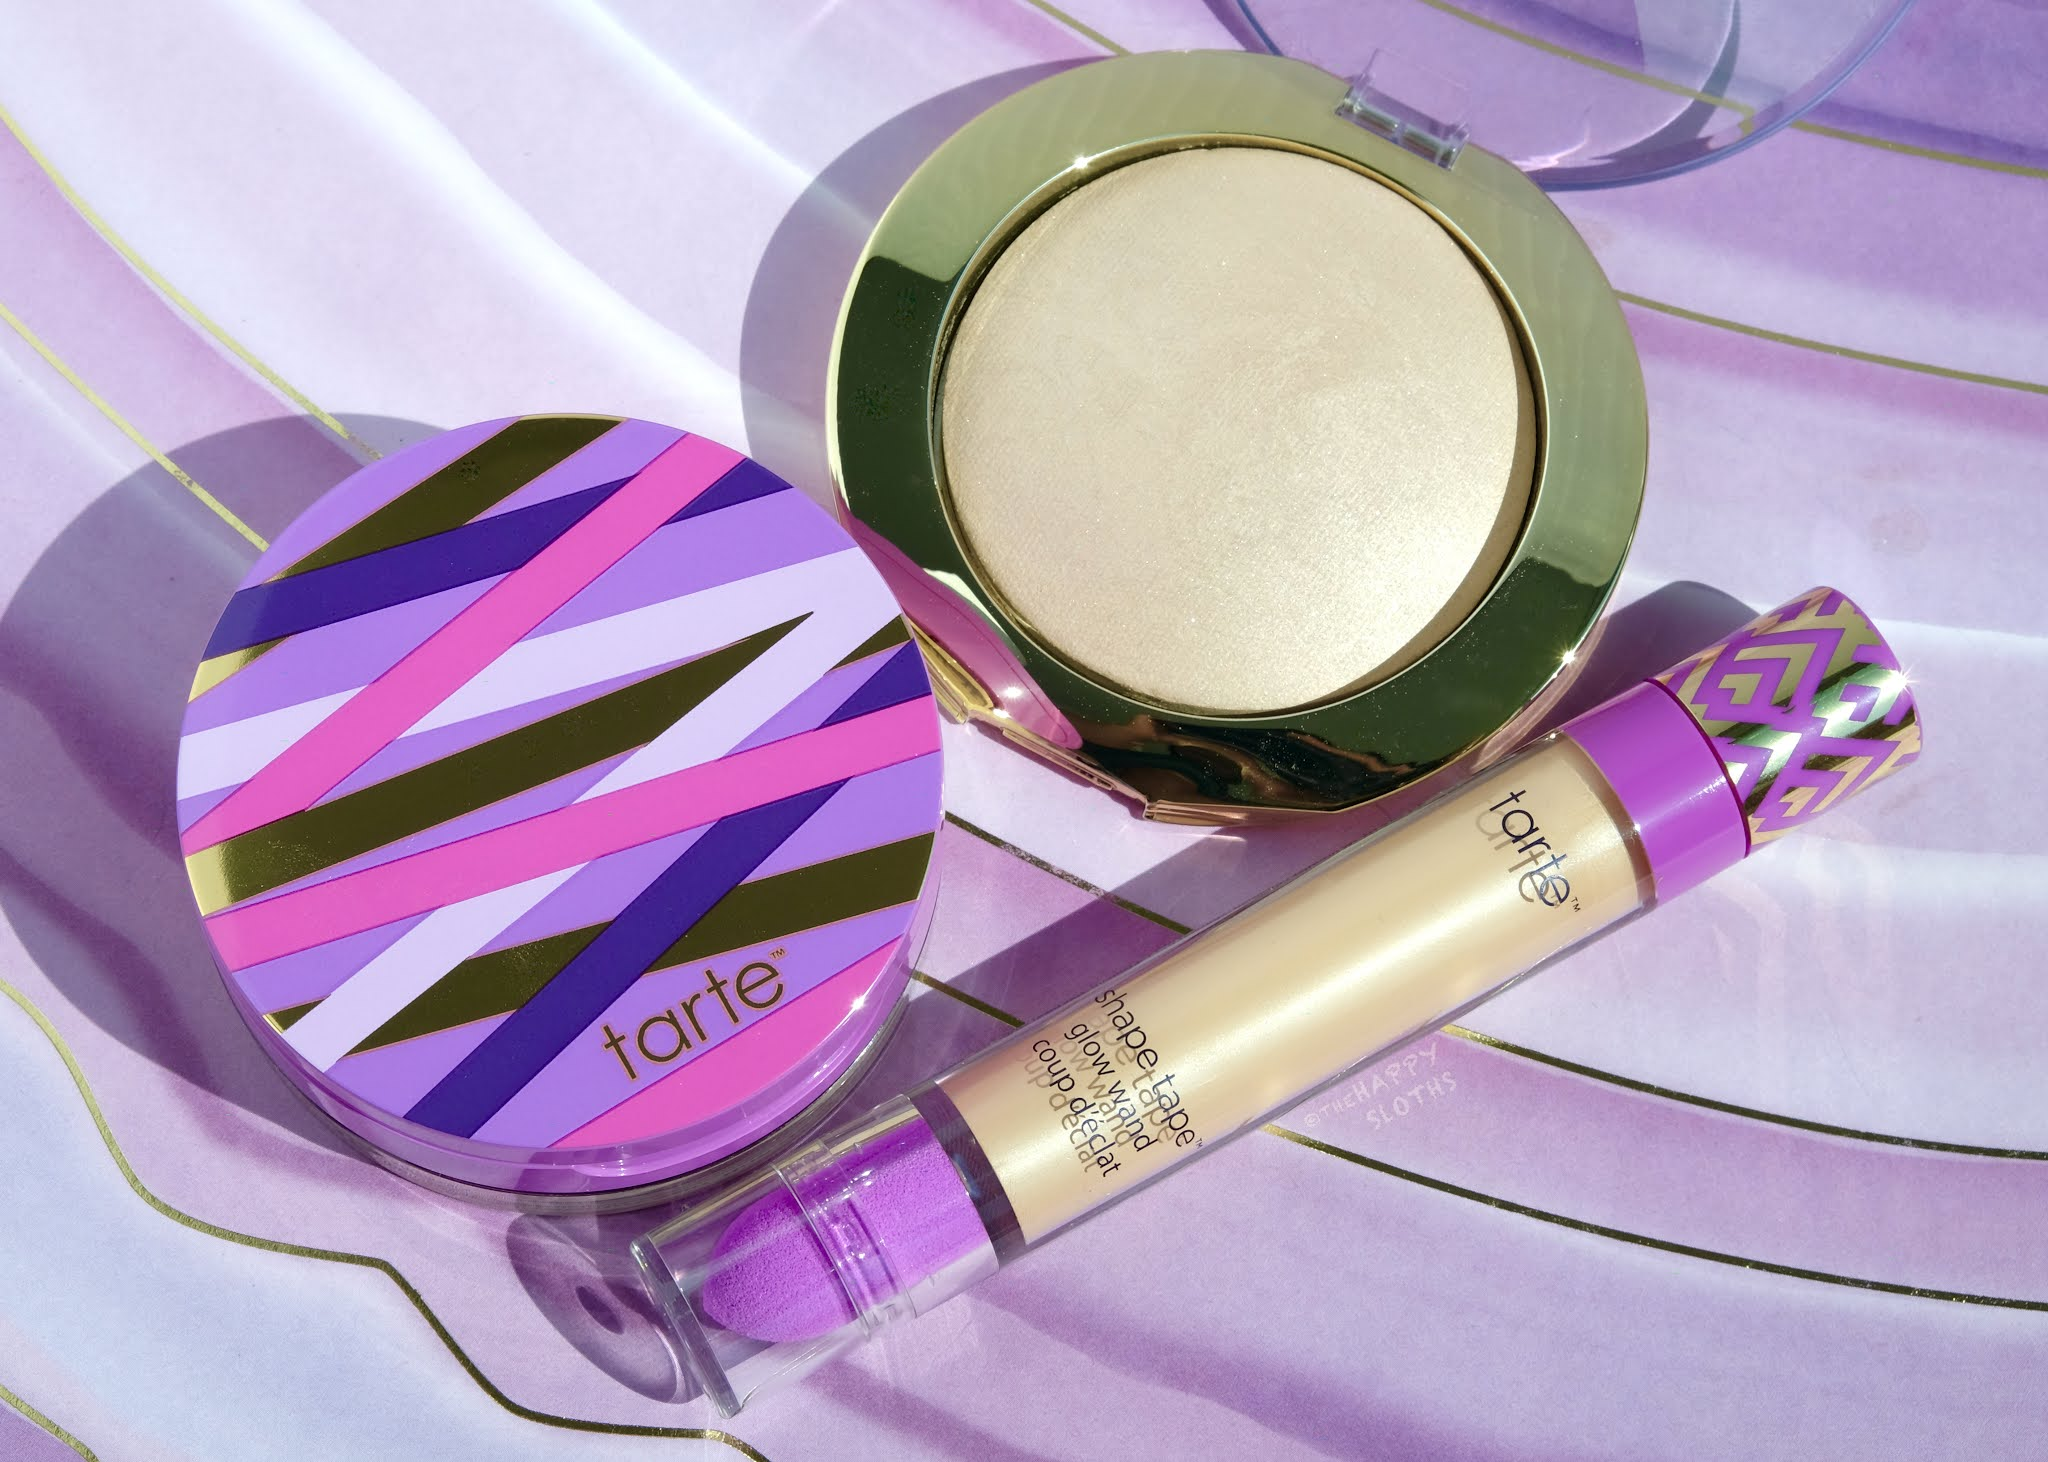 Tarte | Shape Tape Glow Wand, Glow Powder & Setting Powder: Review and Swatches